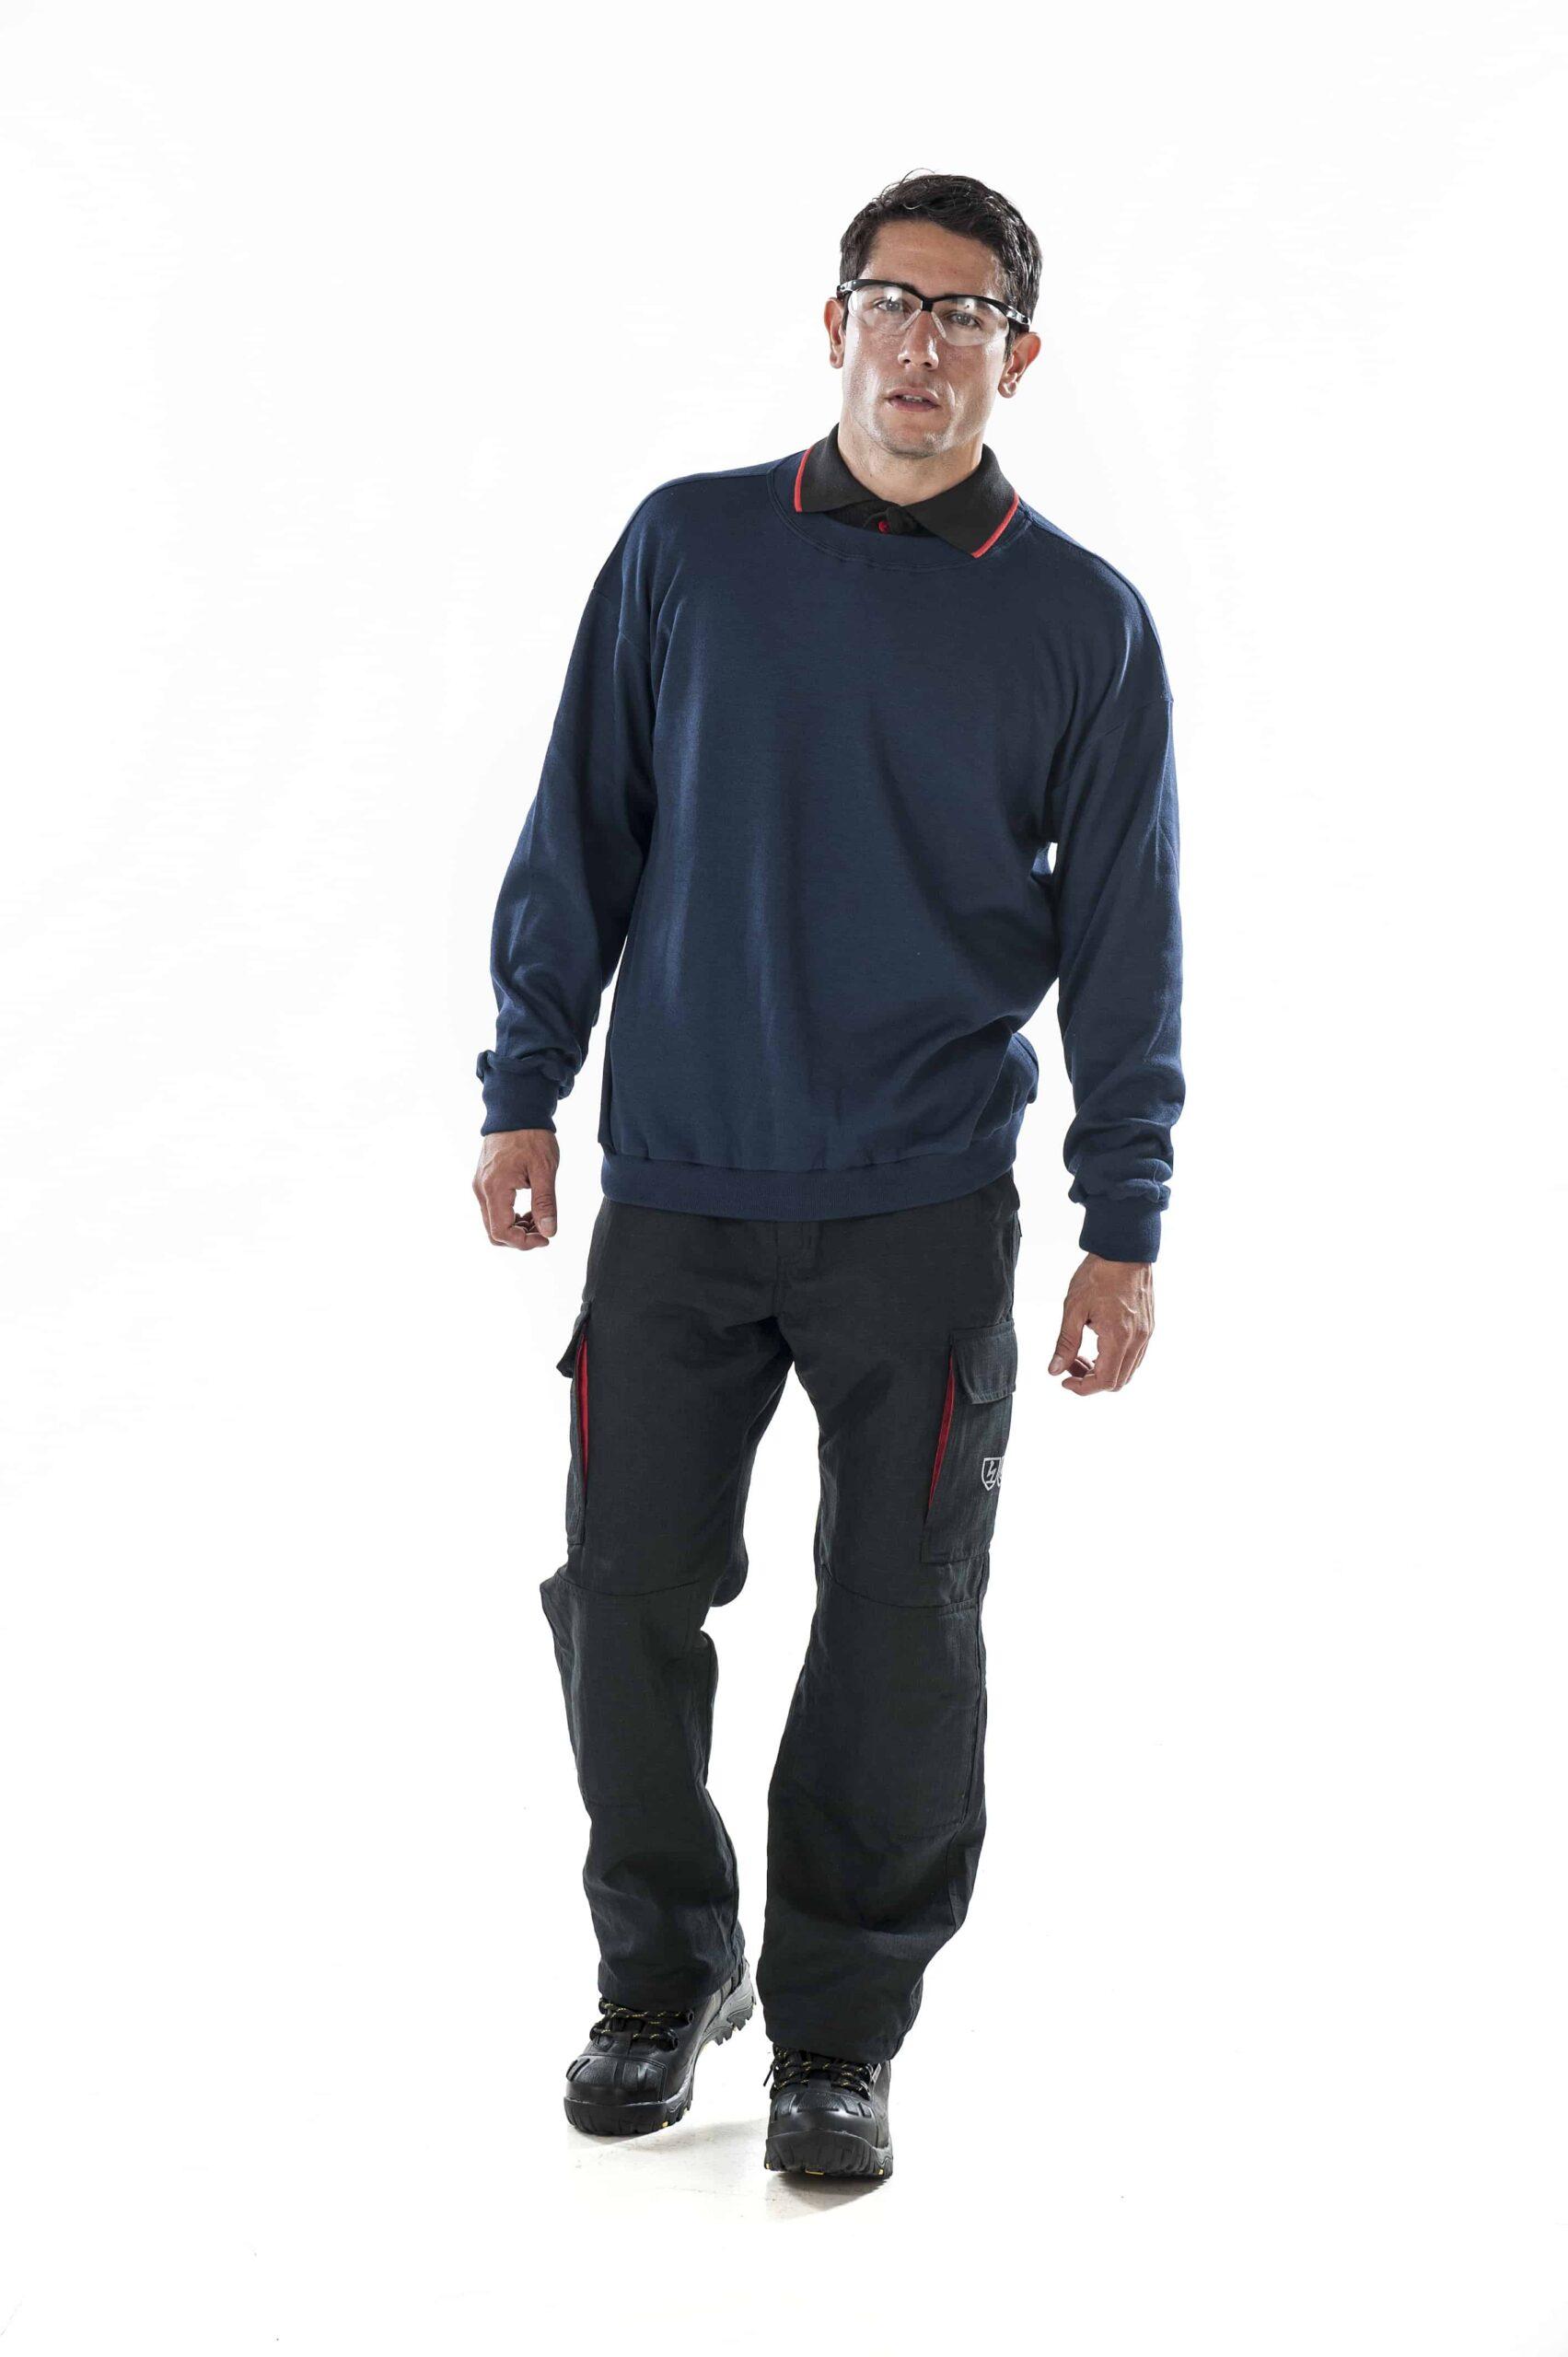 man wearing ArcBan® Blue Sweatshirt and safety glasses